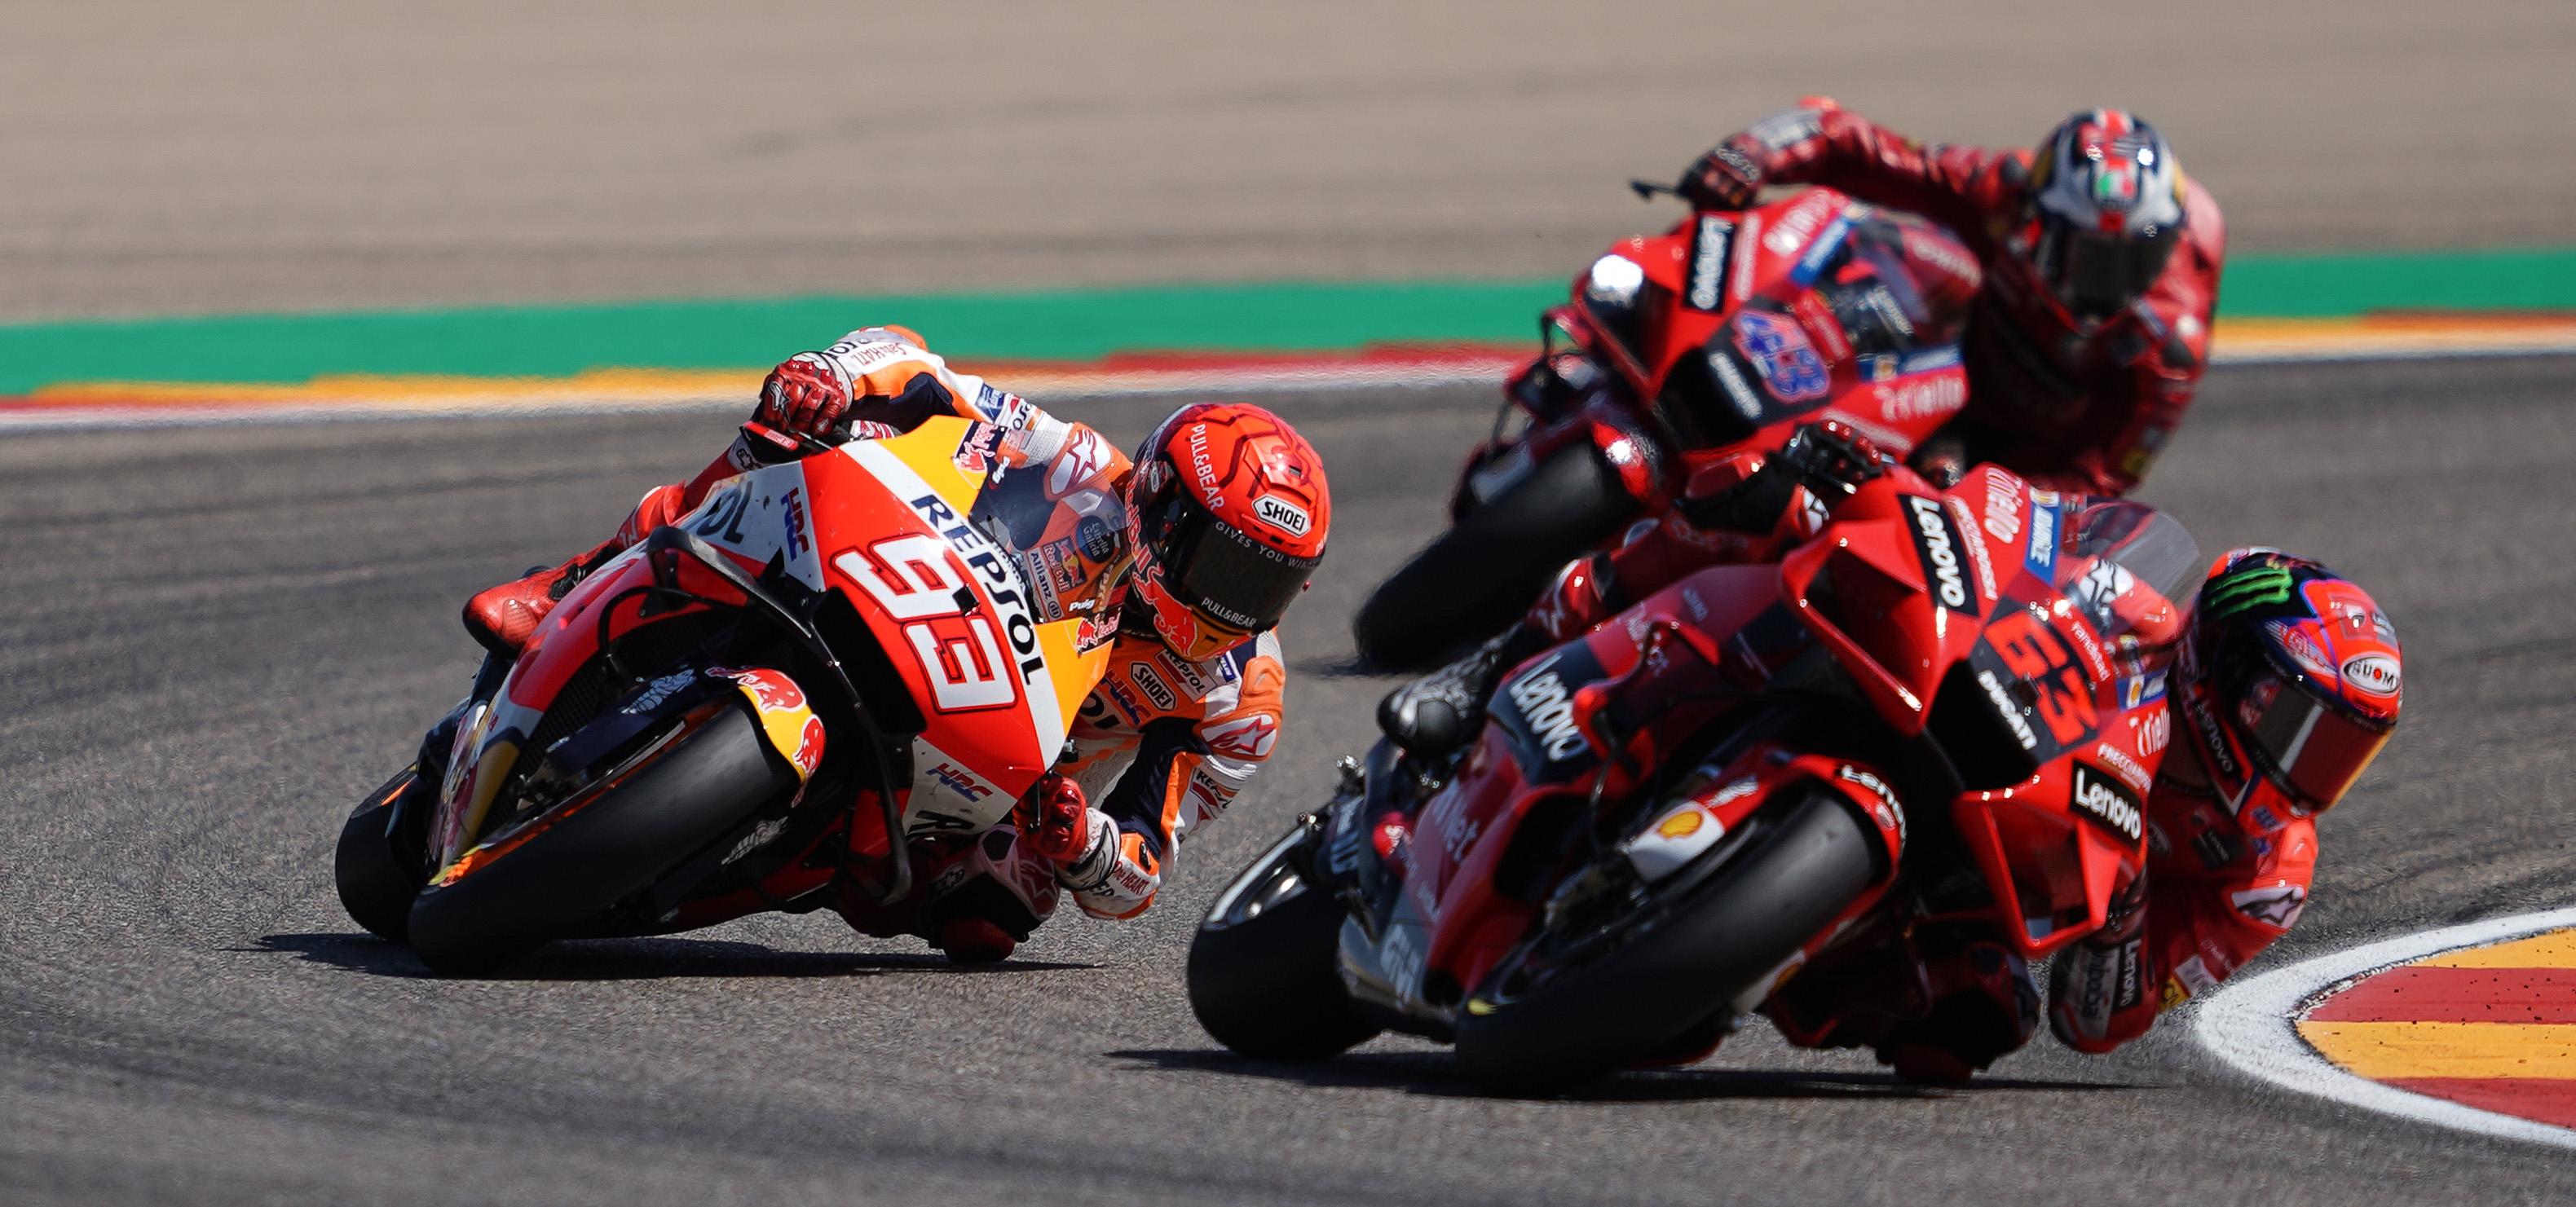 Repsol Honda Team return to action at Misano